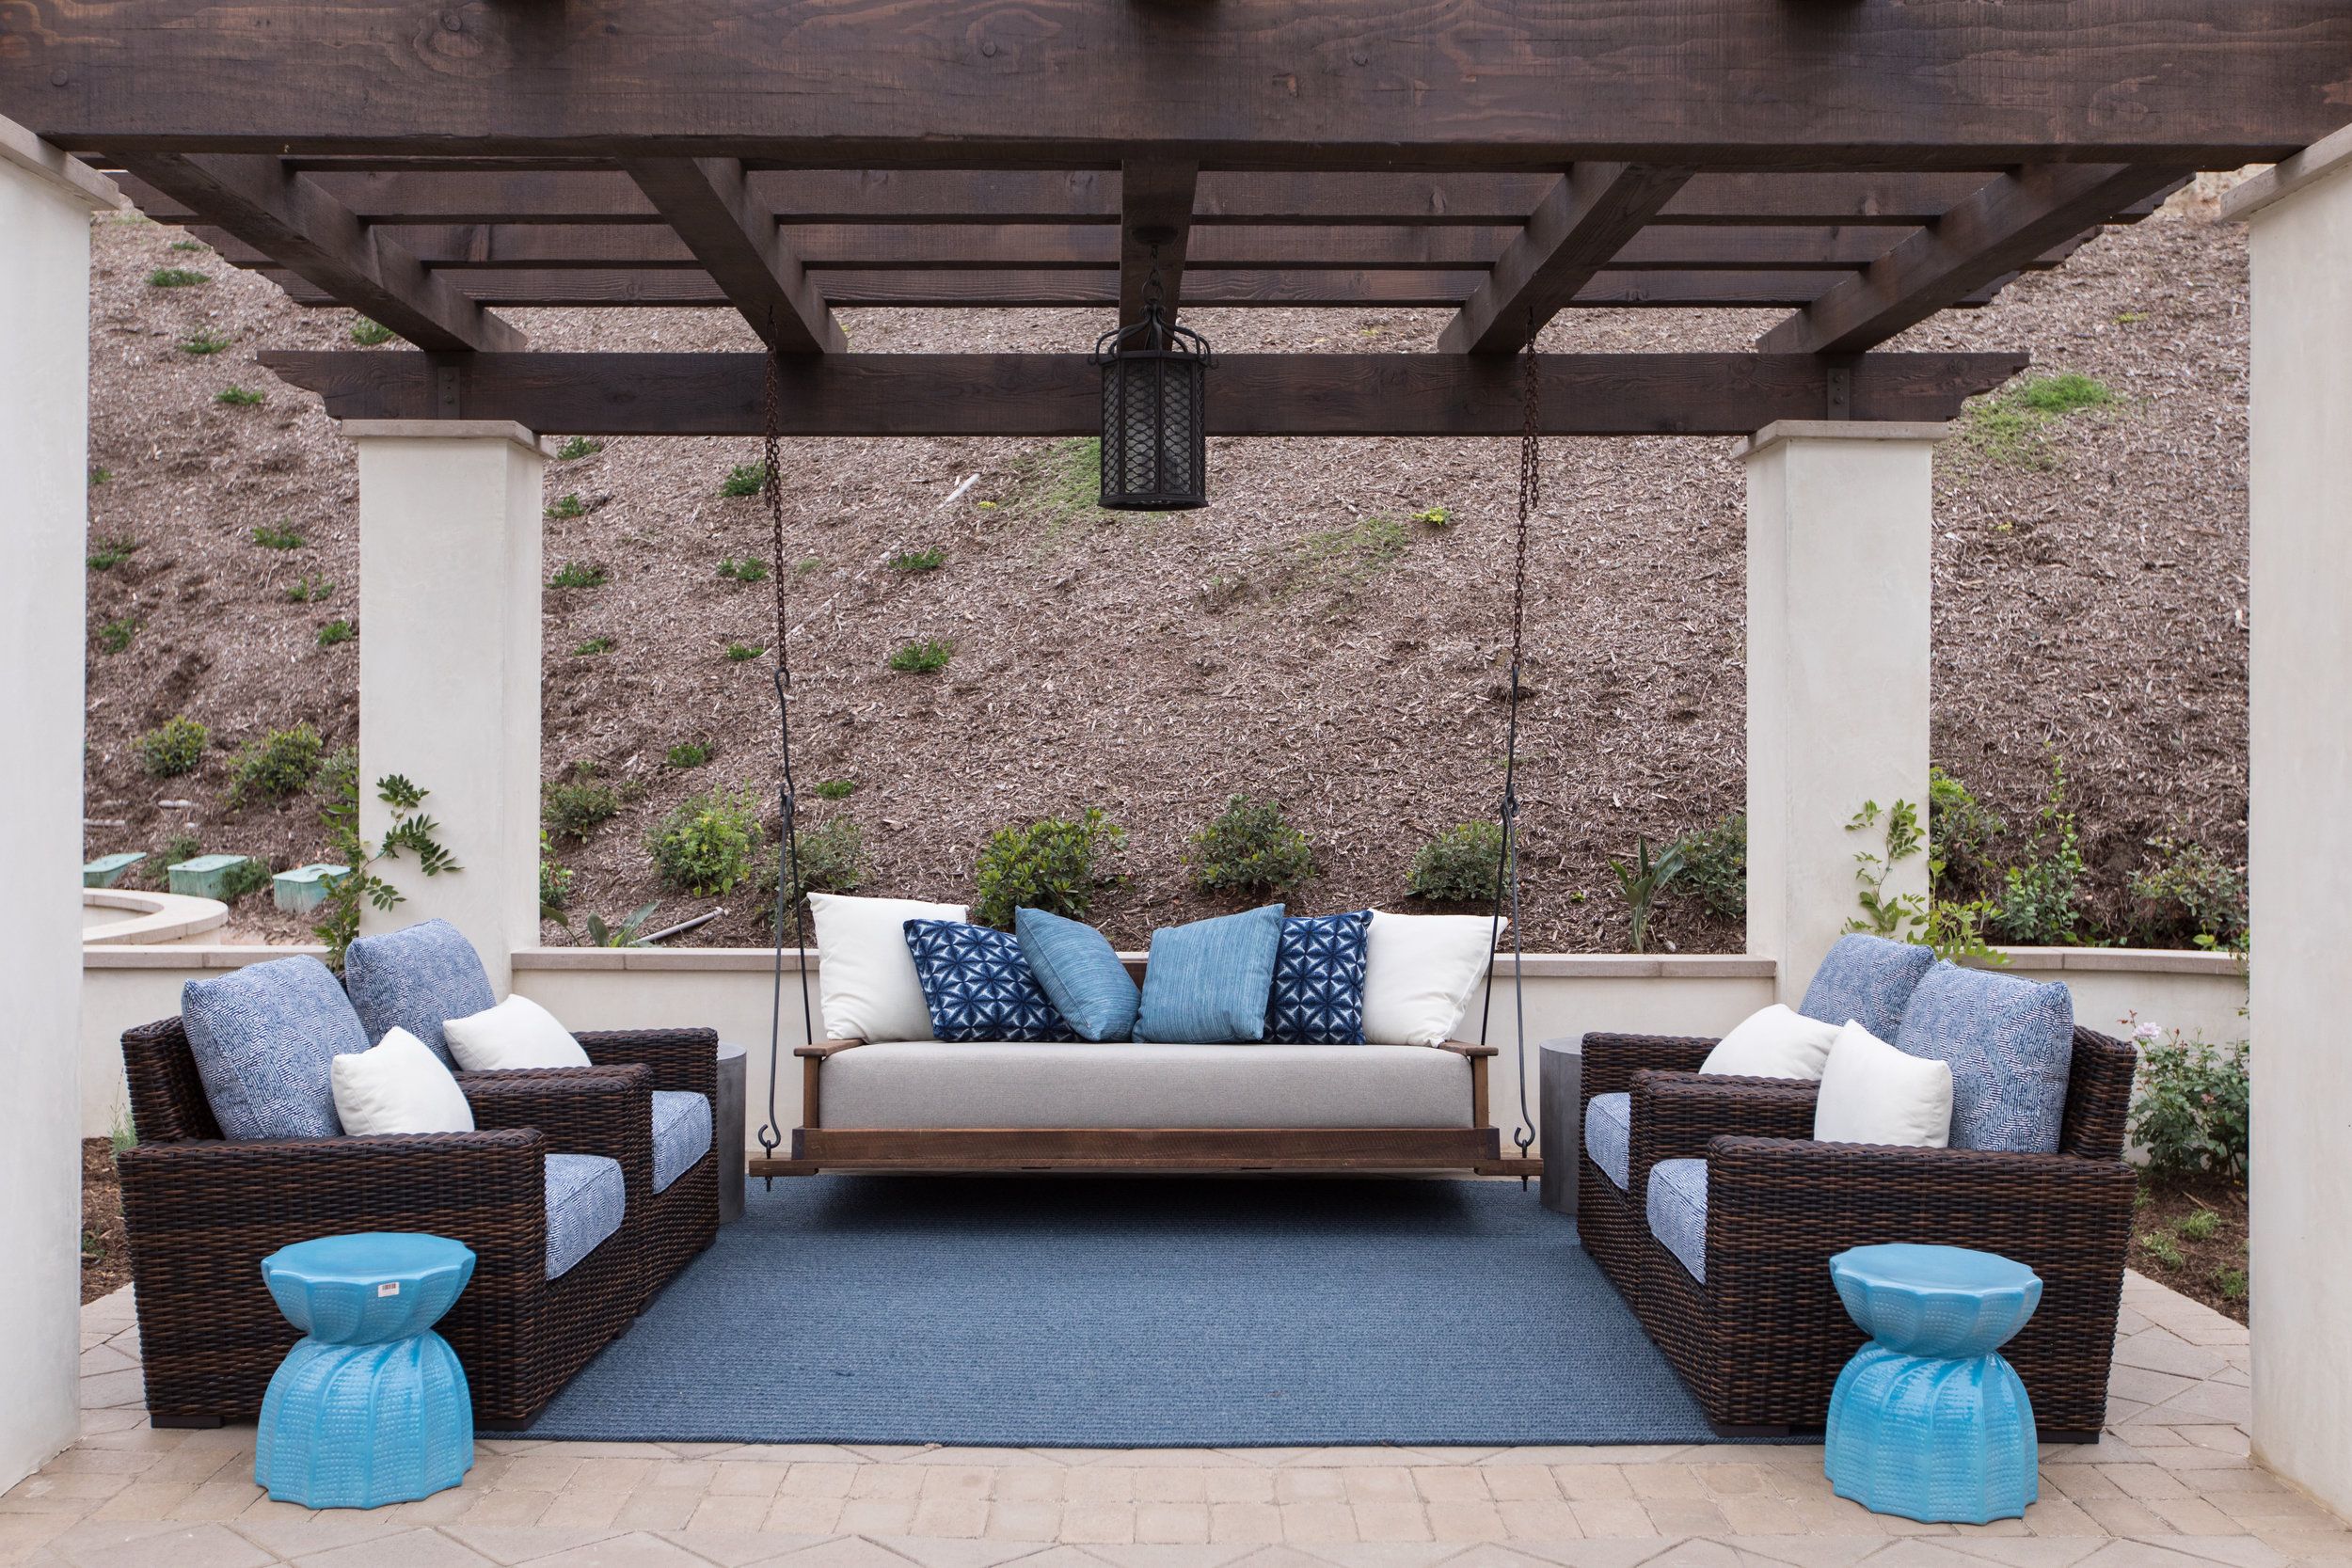 Hilltop Hacienda Outdoor Furniture, Denise Morrison Interiors